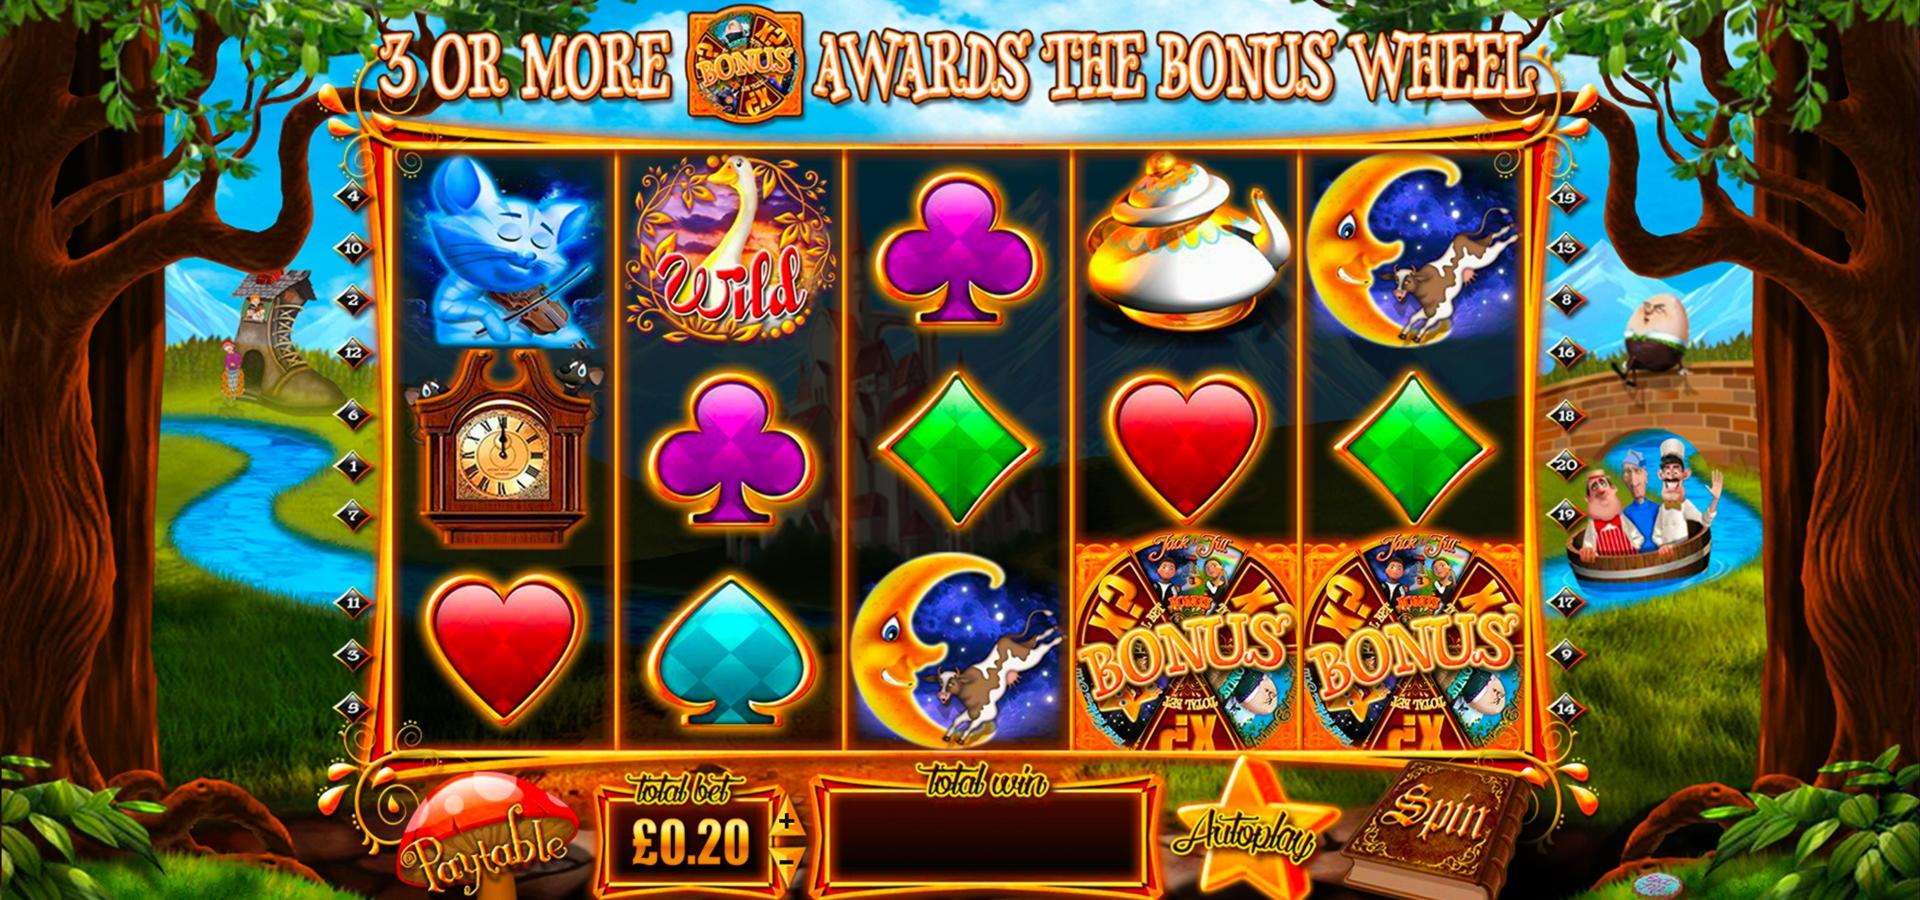 € 3150 kee Bonus am Casino Flume Casino